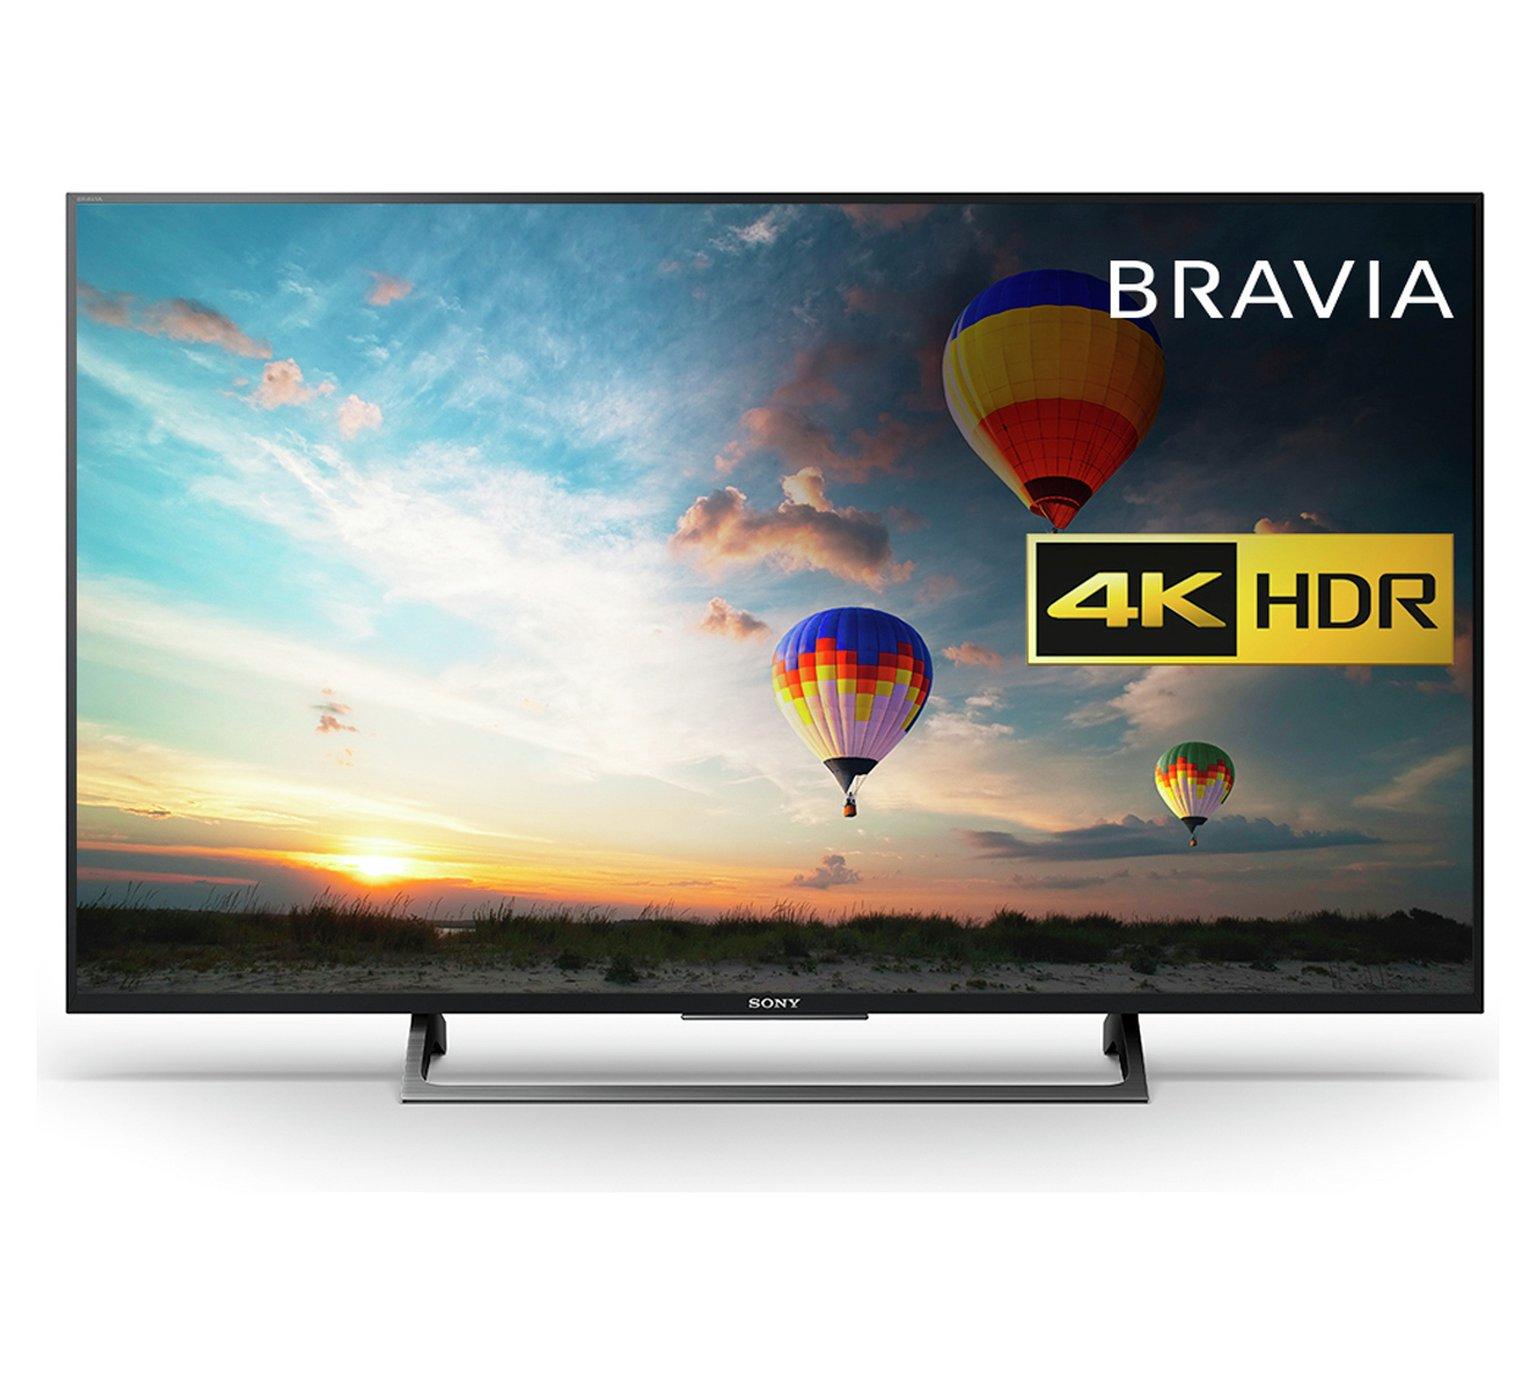 Sony 49XE8004 4K Ultra HD TV Argos £584.10 with code TV10